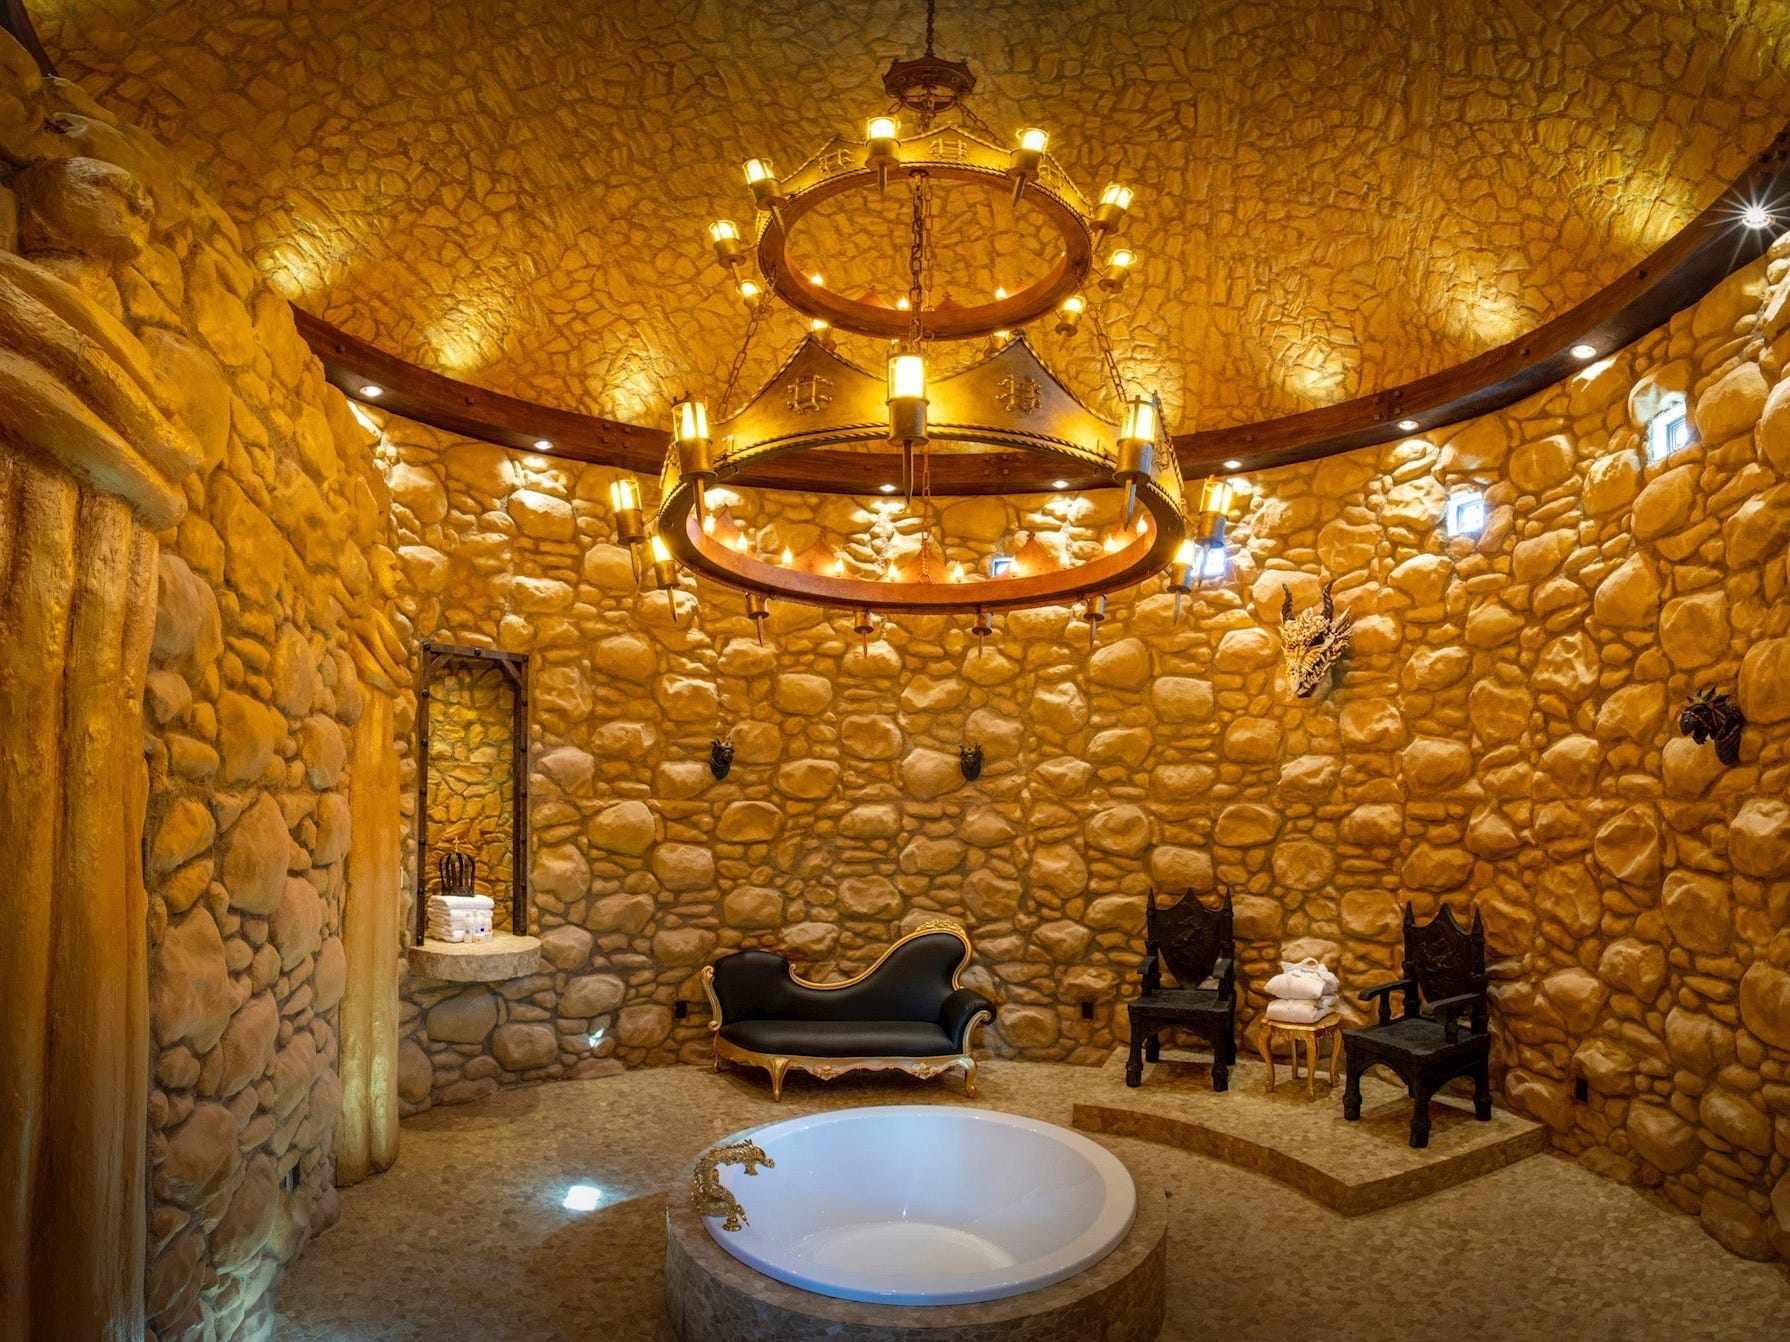 hotels room hot tubs budget